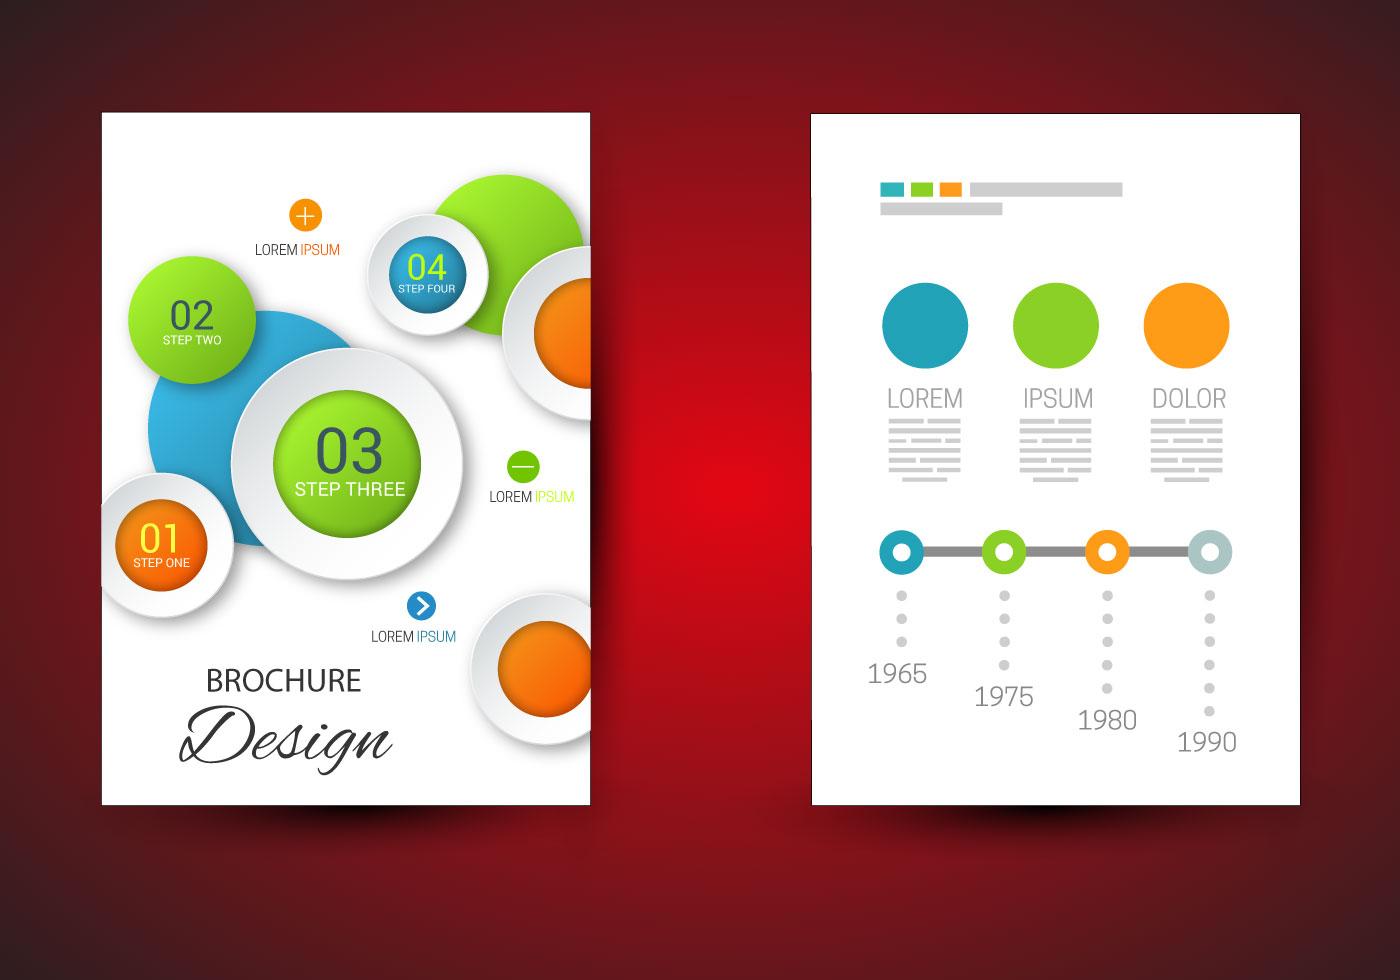 Free Brochure Template Vector  Download Free Vector Art Stock Graphics  Images